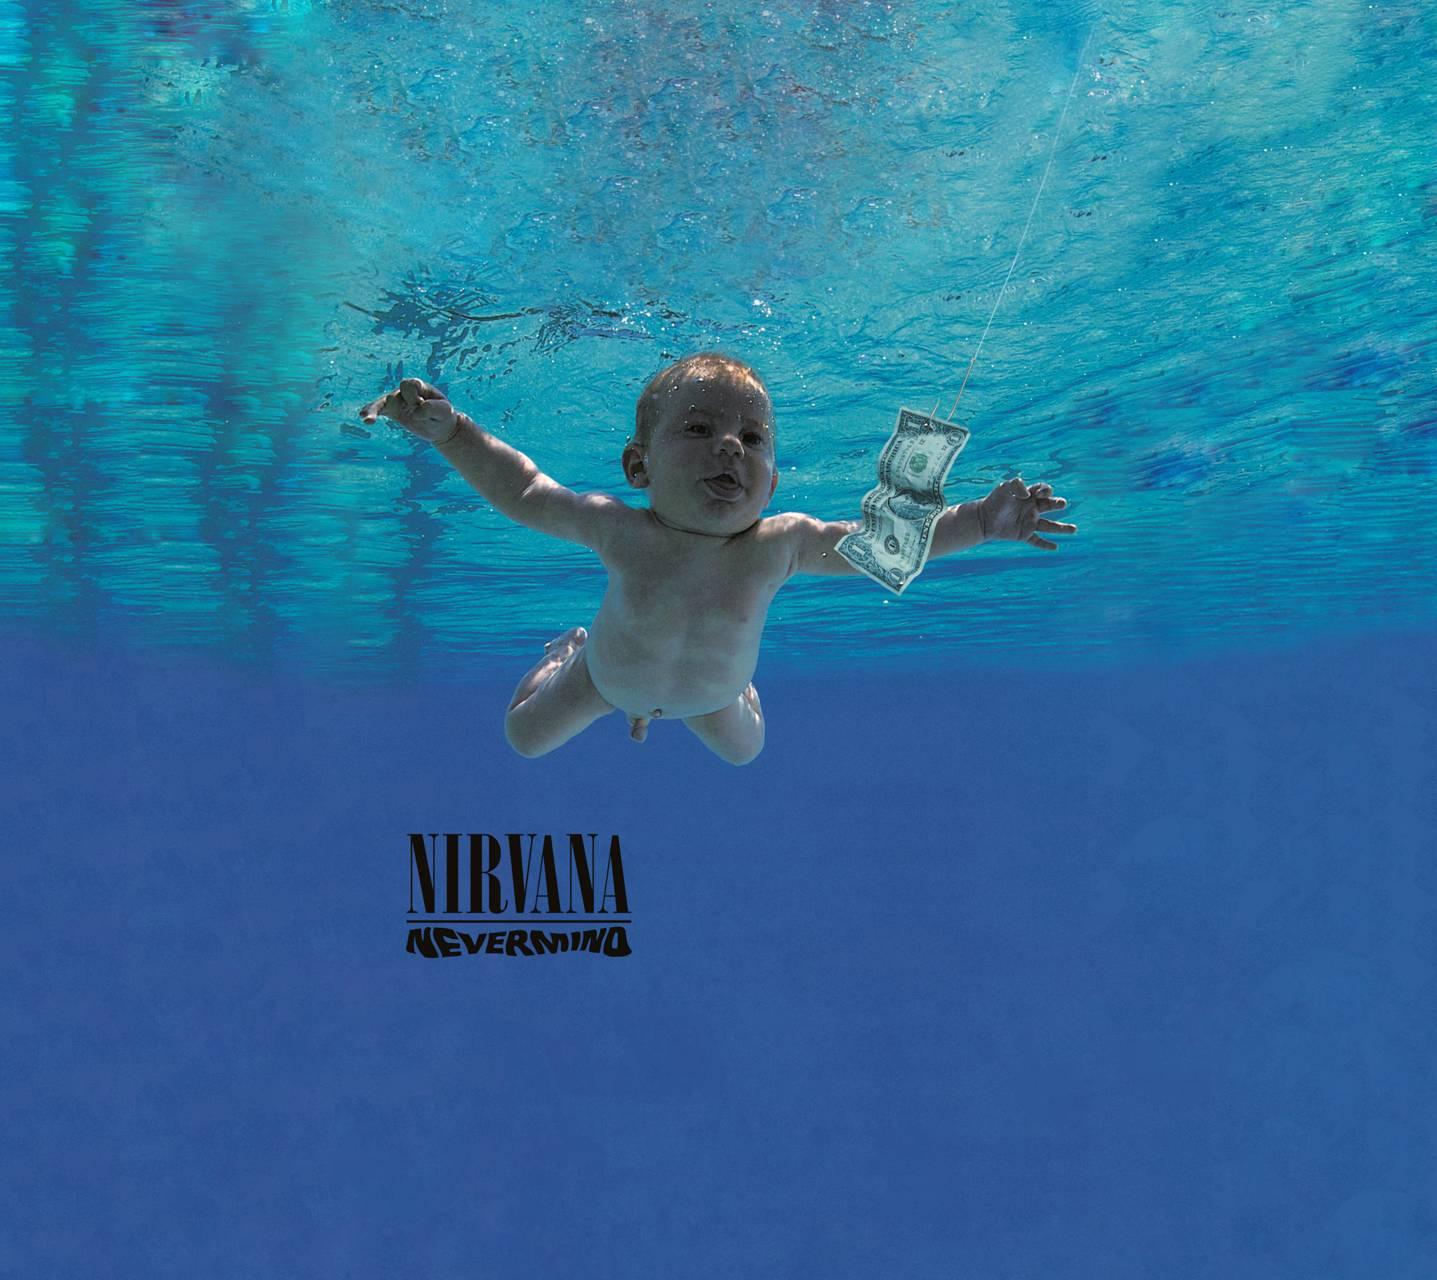 Nirvana PC Wallpaper